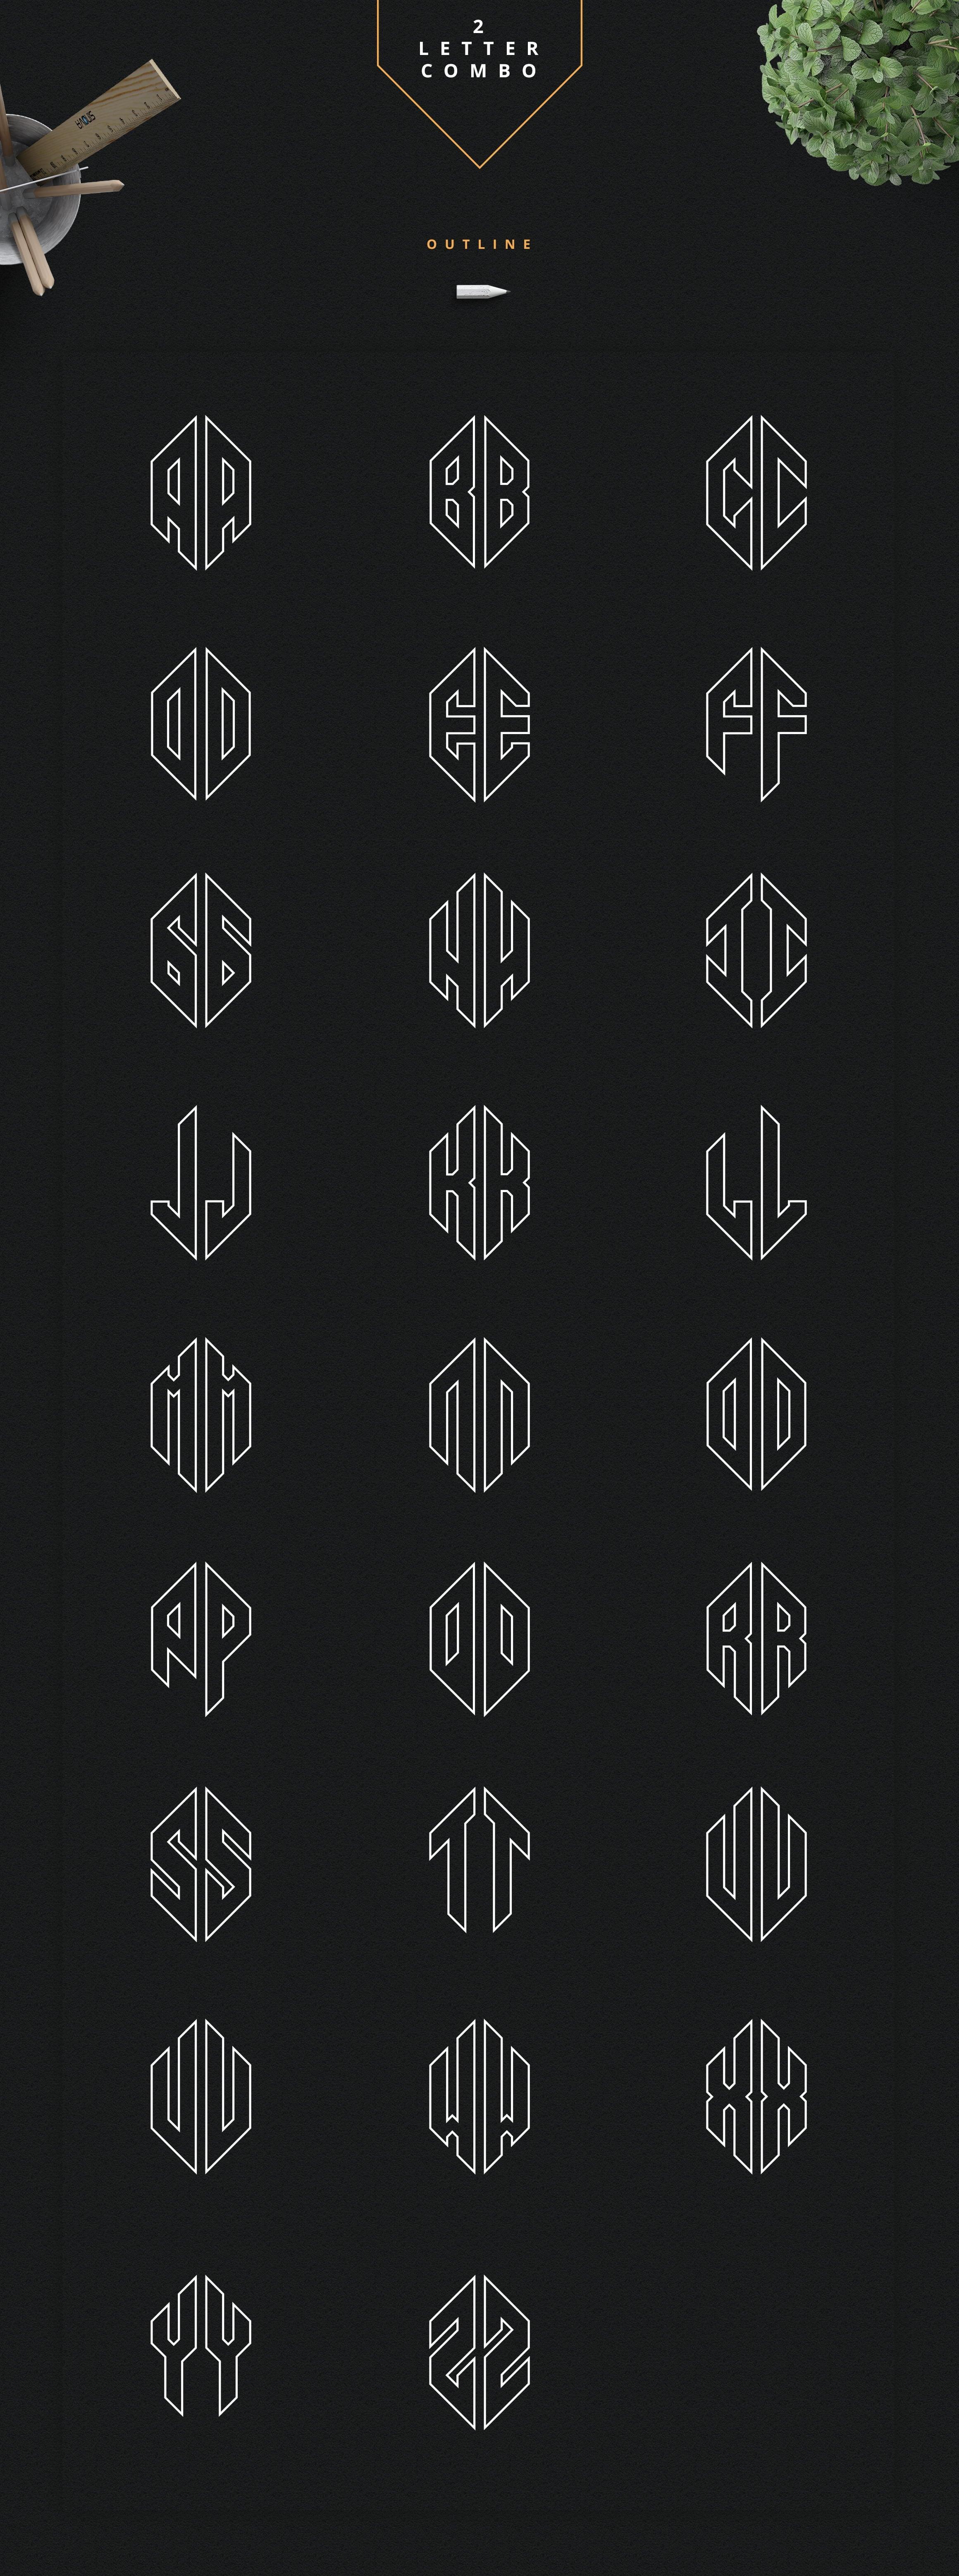 Ultimate Monogram Creator: 6-in-1 - just $14 - 6 3